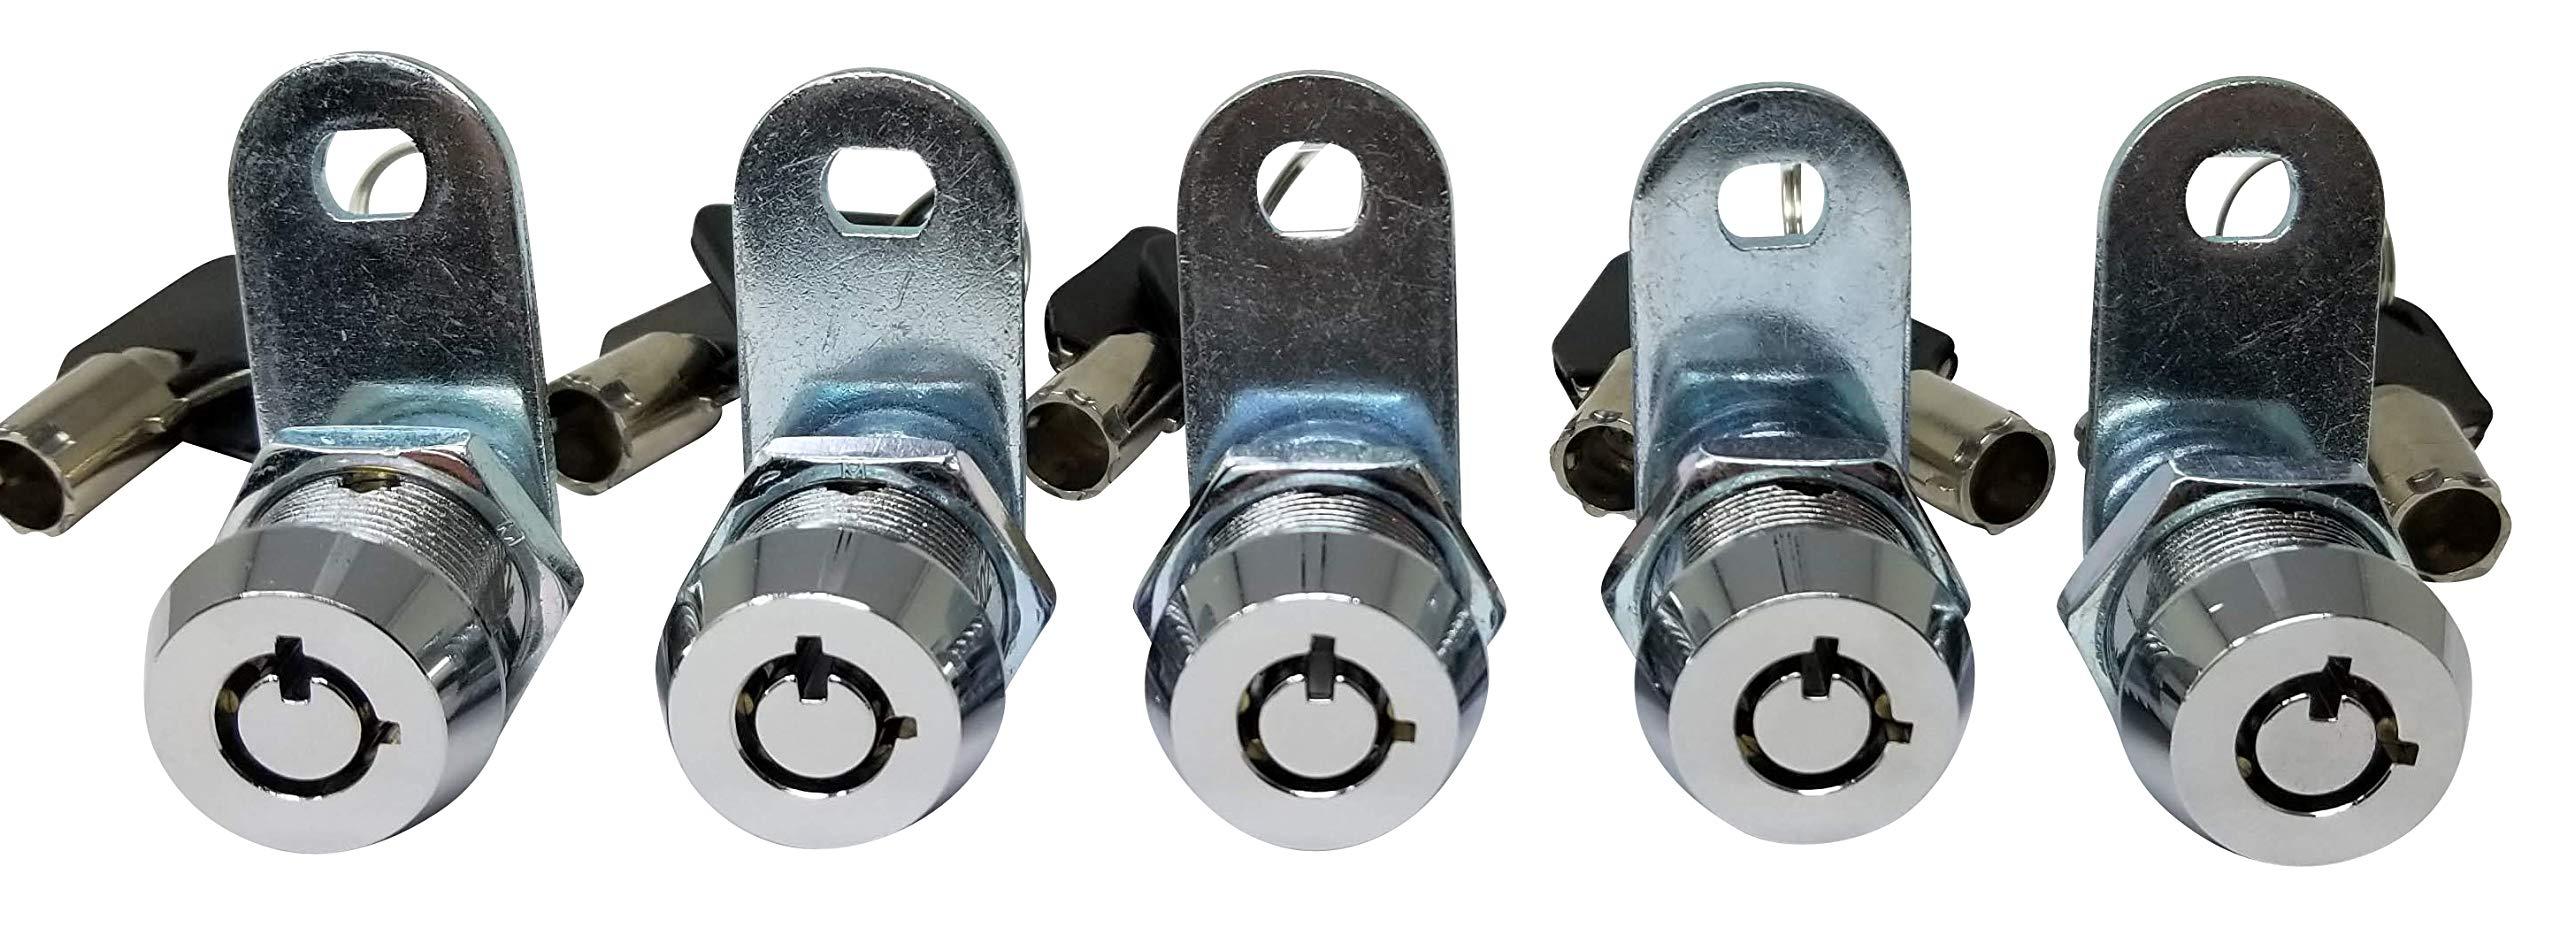 Tubular Cam Lock with Chrome Finish, Keyed Alike Removable Key (5/8'', Pack of 5) by Products Quad (Image #6)